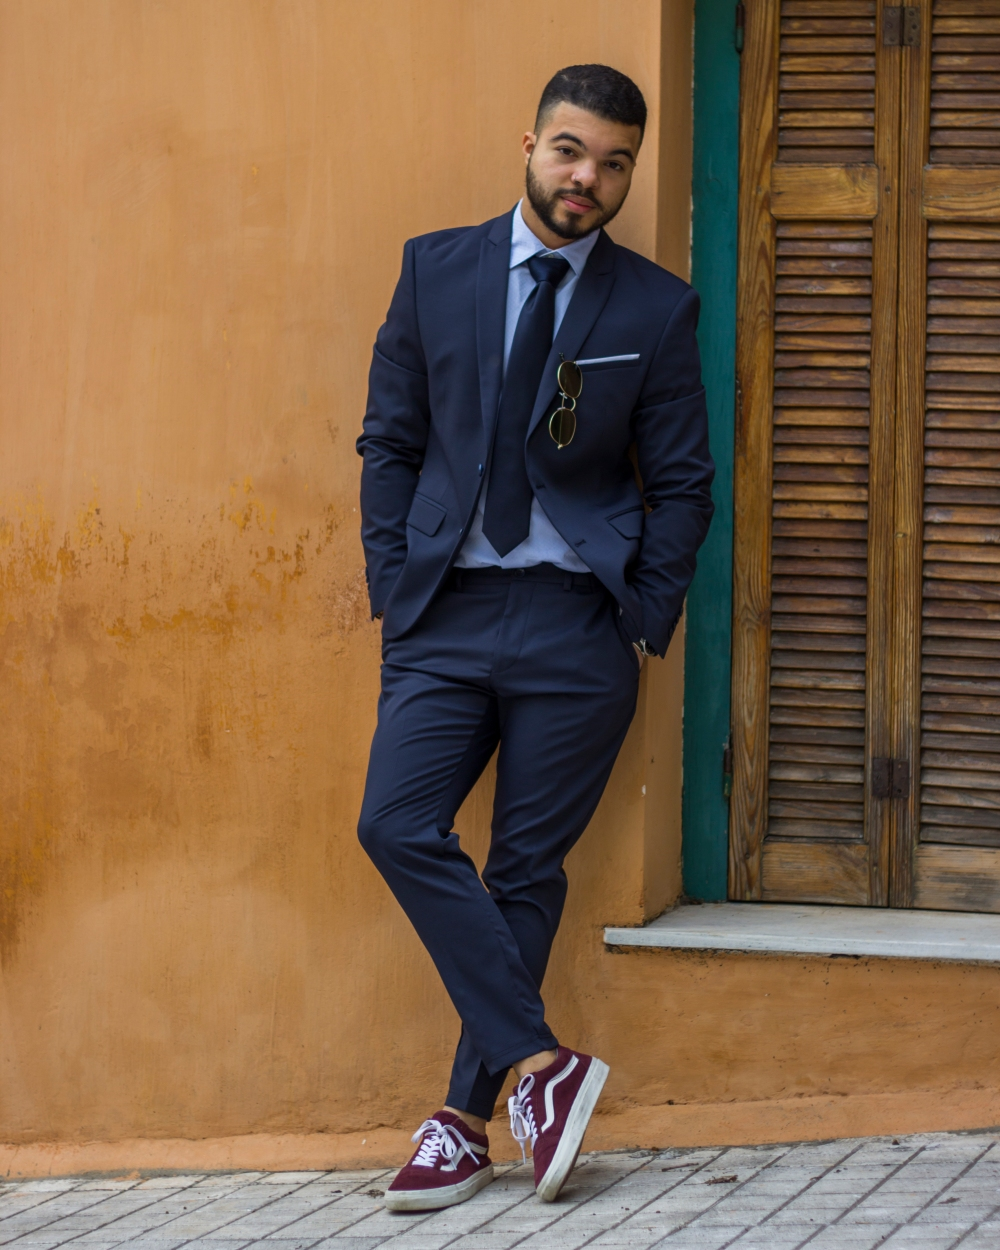 LewysMaceo_StealHisStyle_JustNatonya_navy blue suit